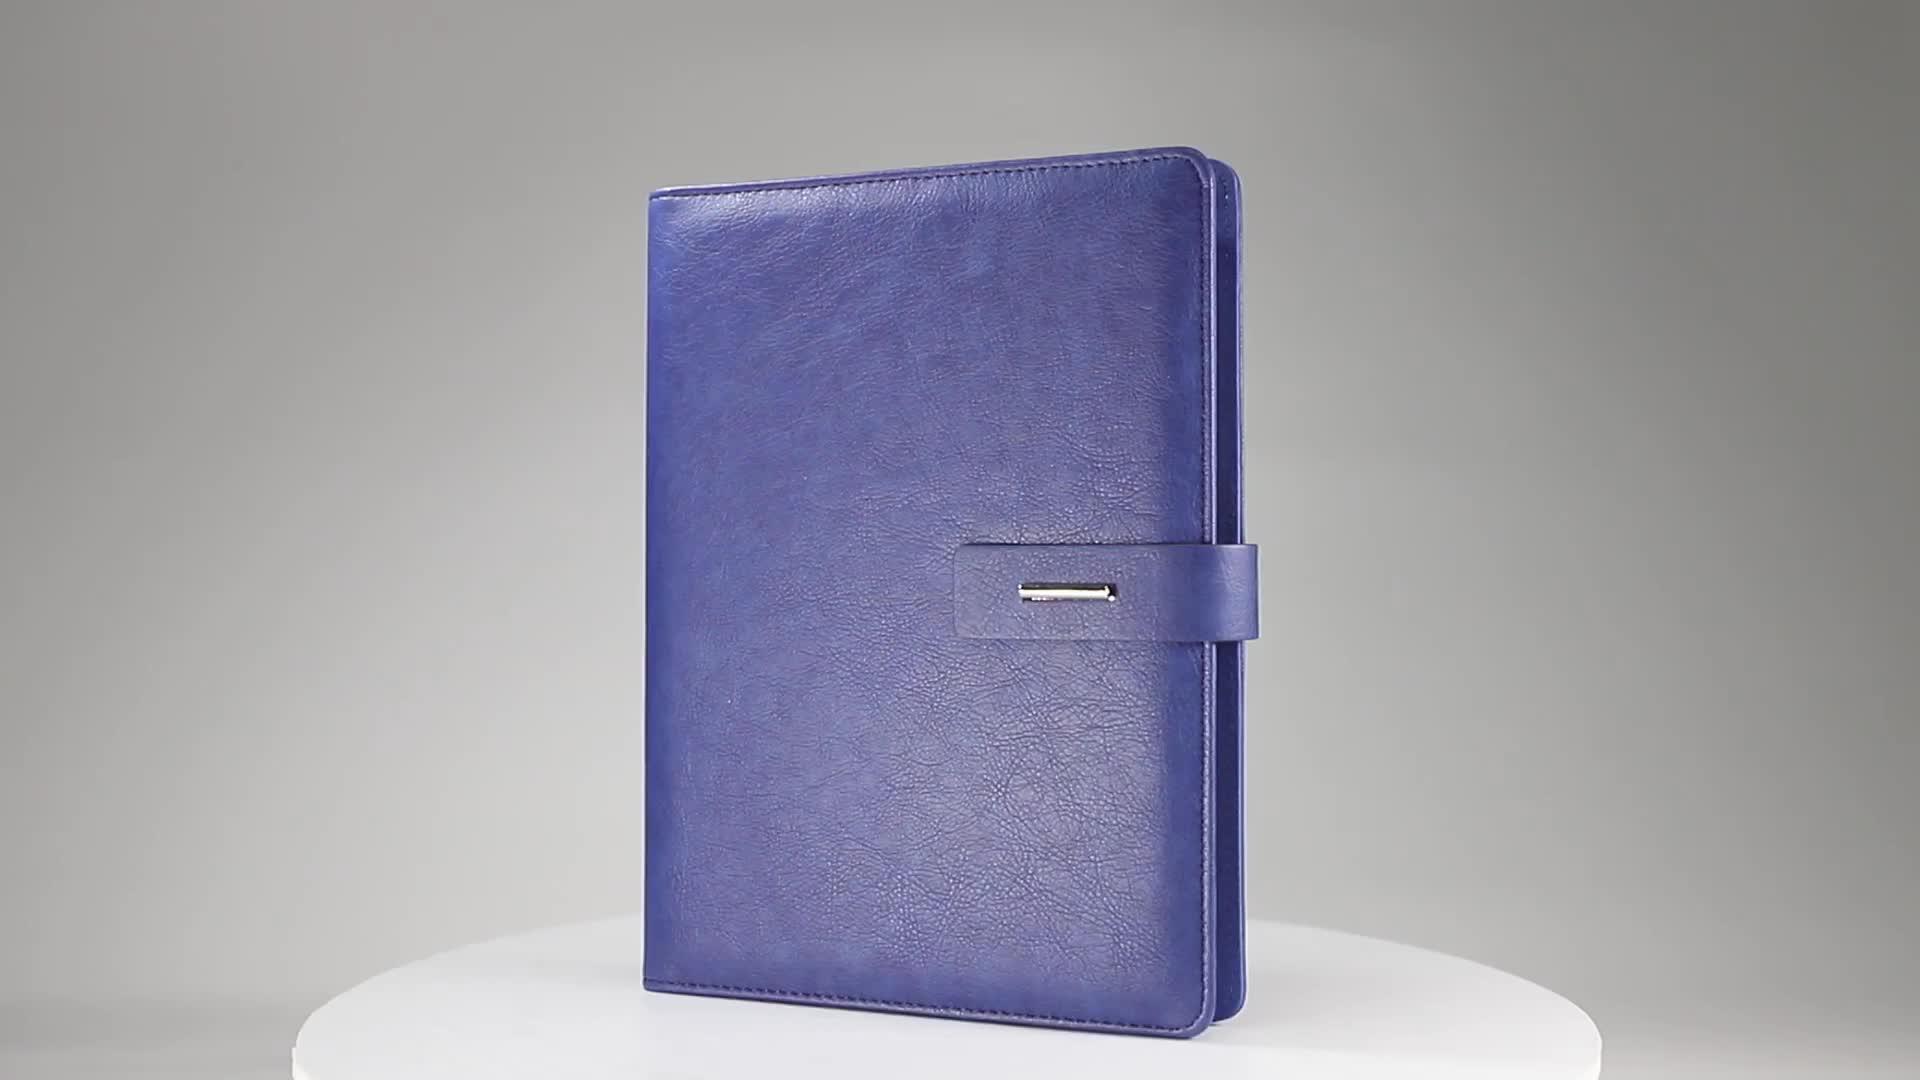 Agenda leather 2019 2020 gift set large calendar loose leaf planner organizer diary notebook odm